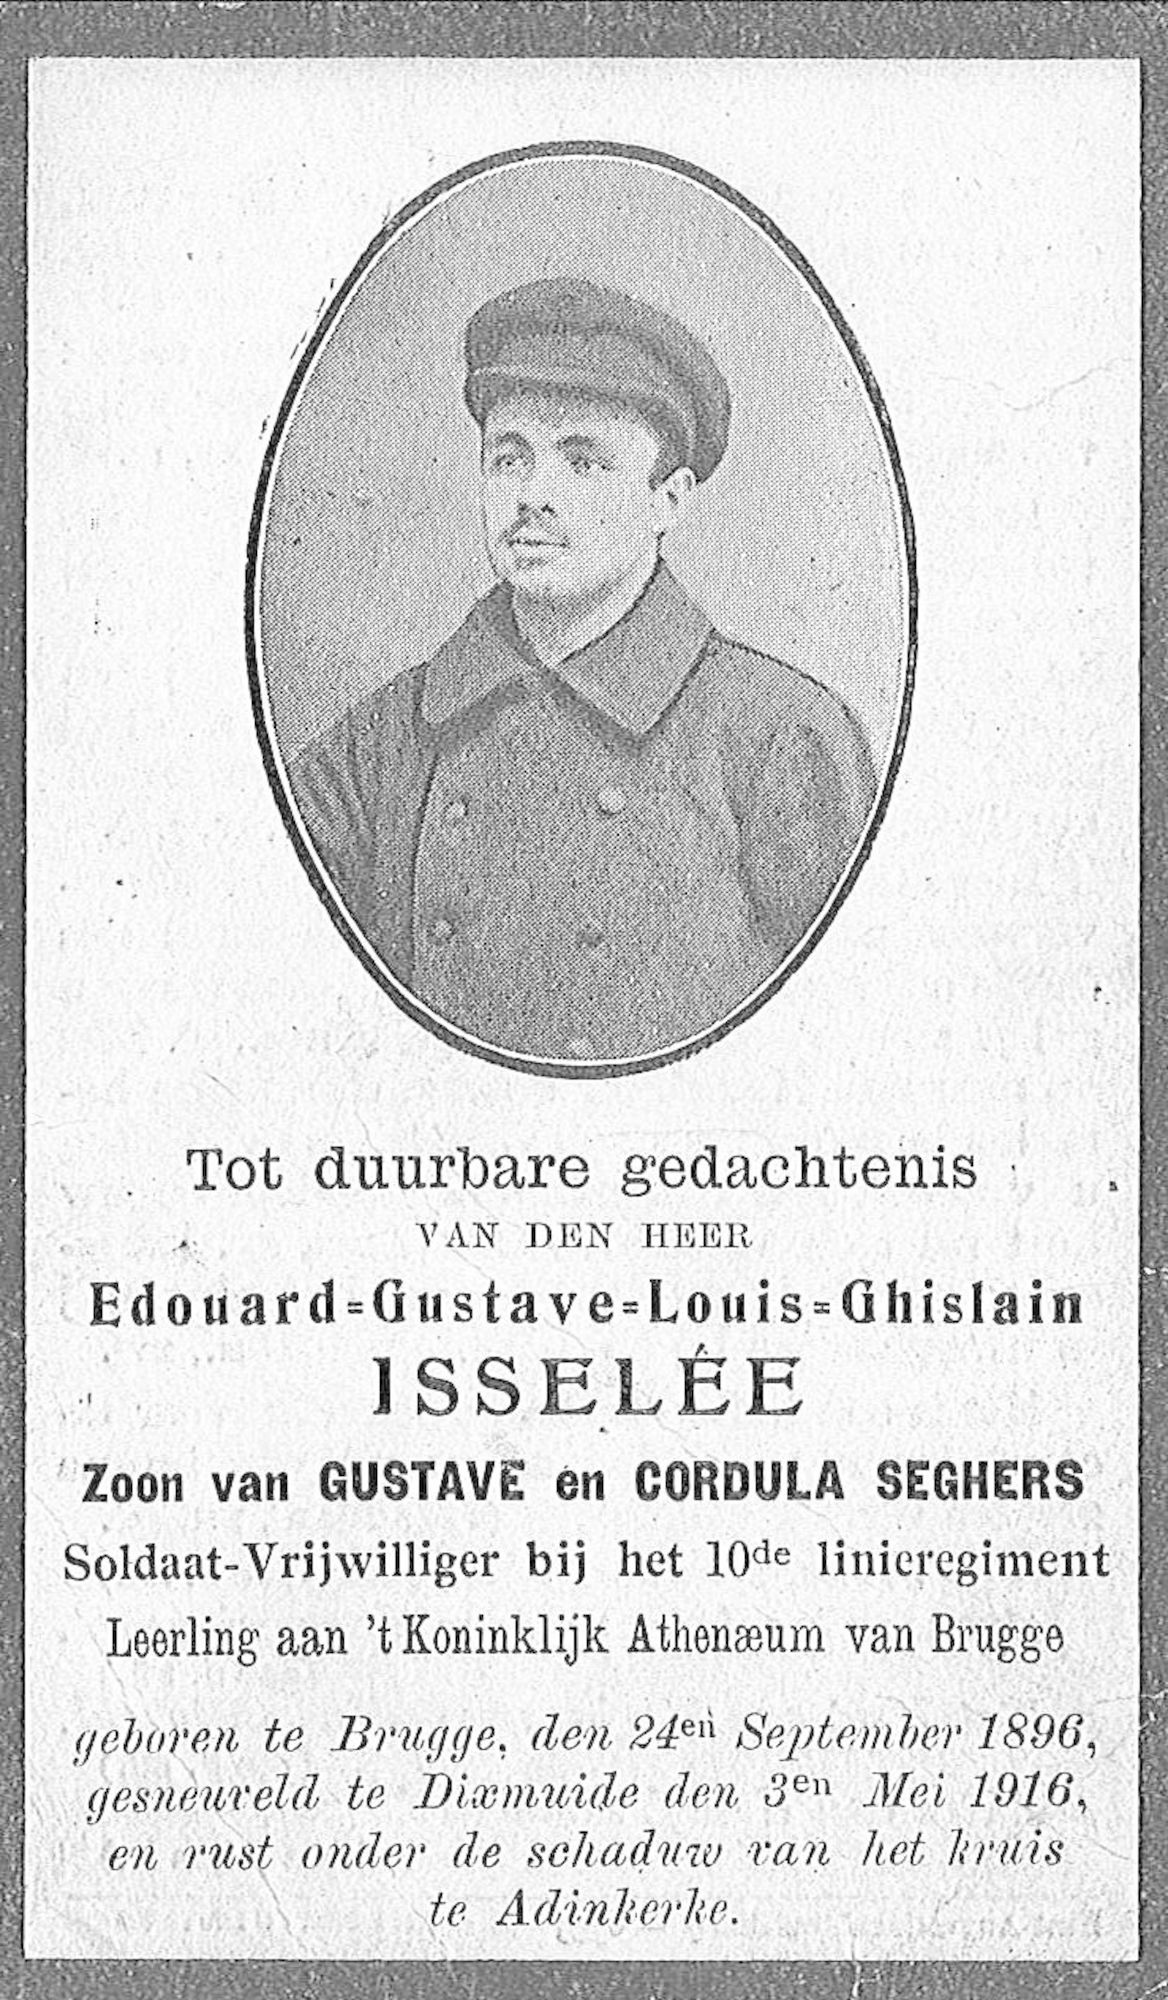 Edouard-Gustave-Louis-Ghislain Isselée